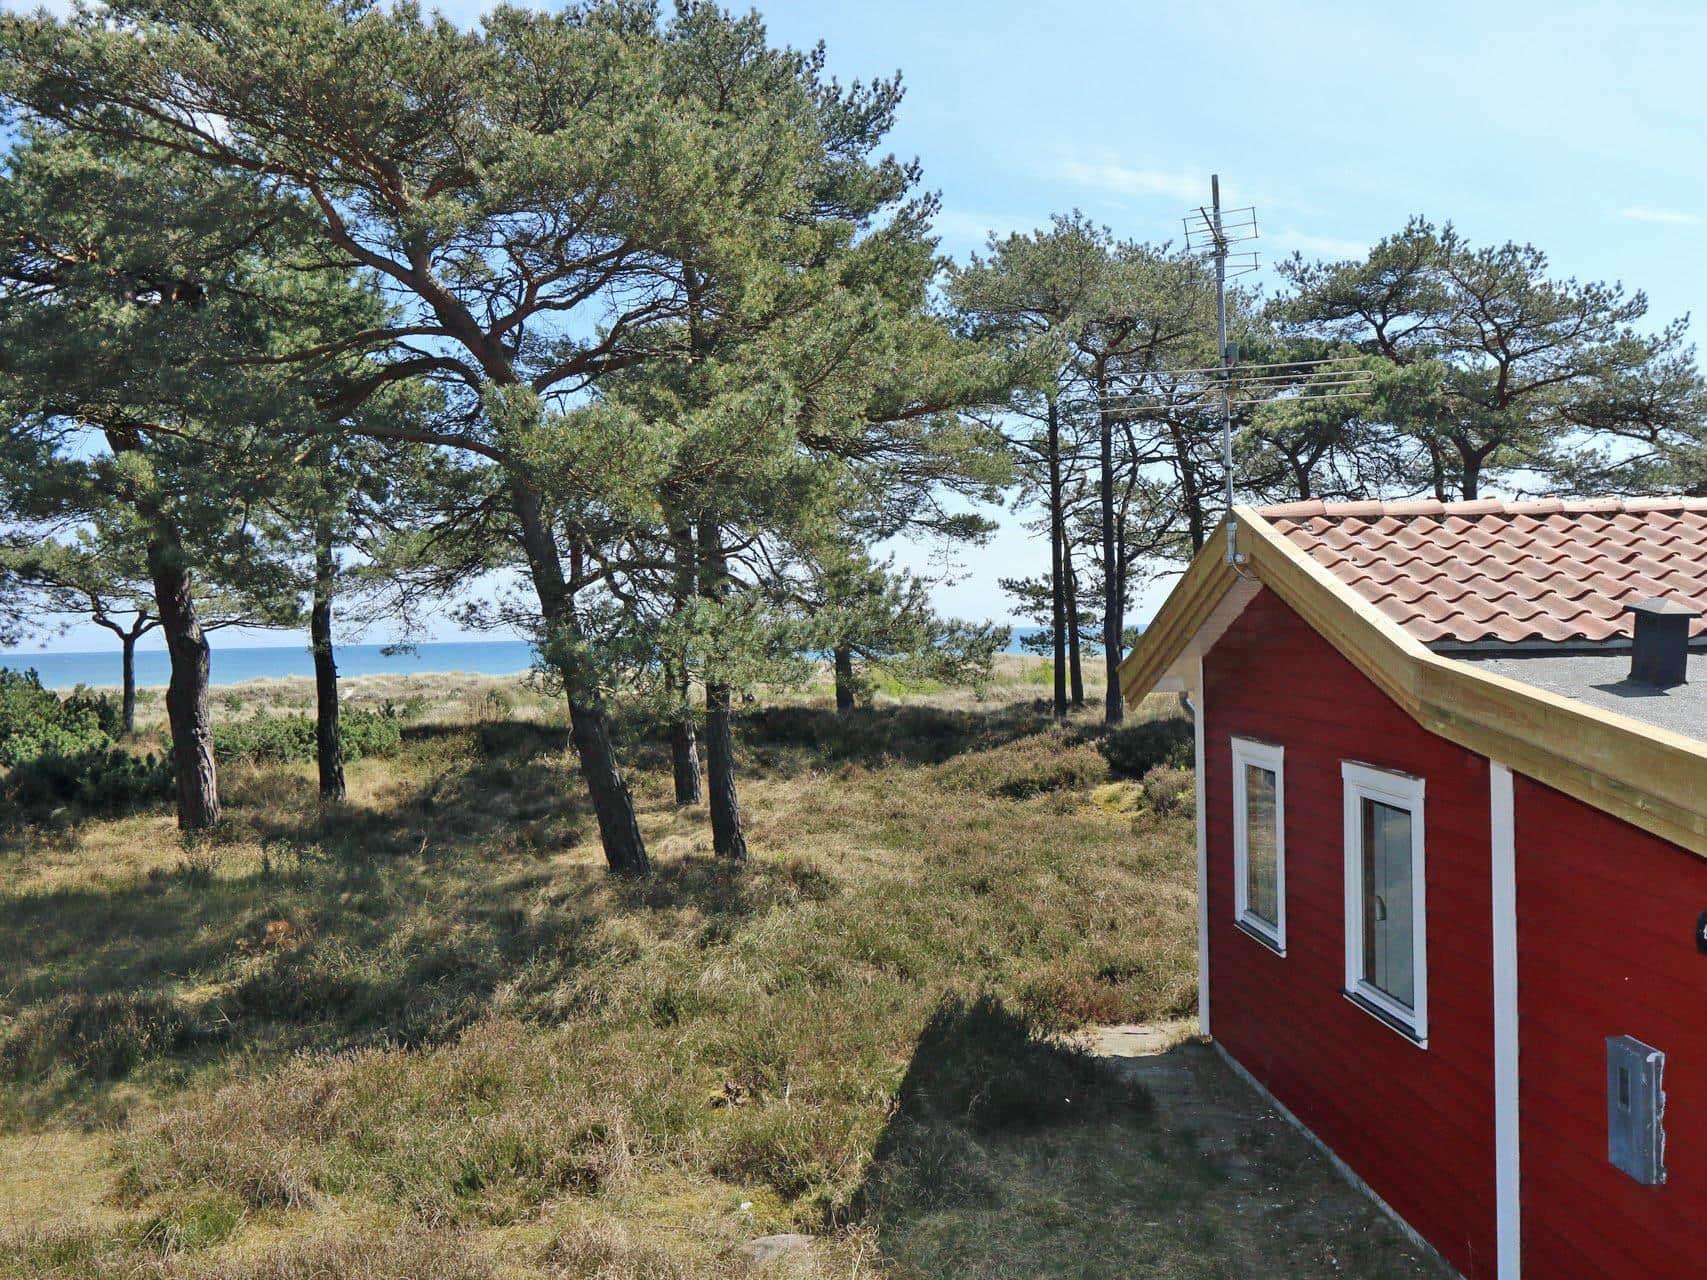 Billede 1-10 Sommerhus 2618, Kolonivejen 4, DK - 3730 Nexø